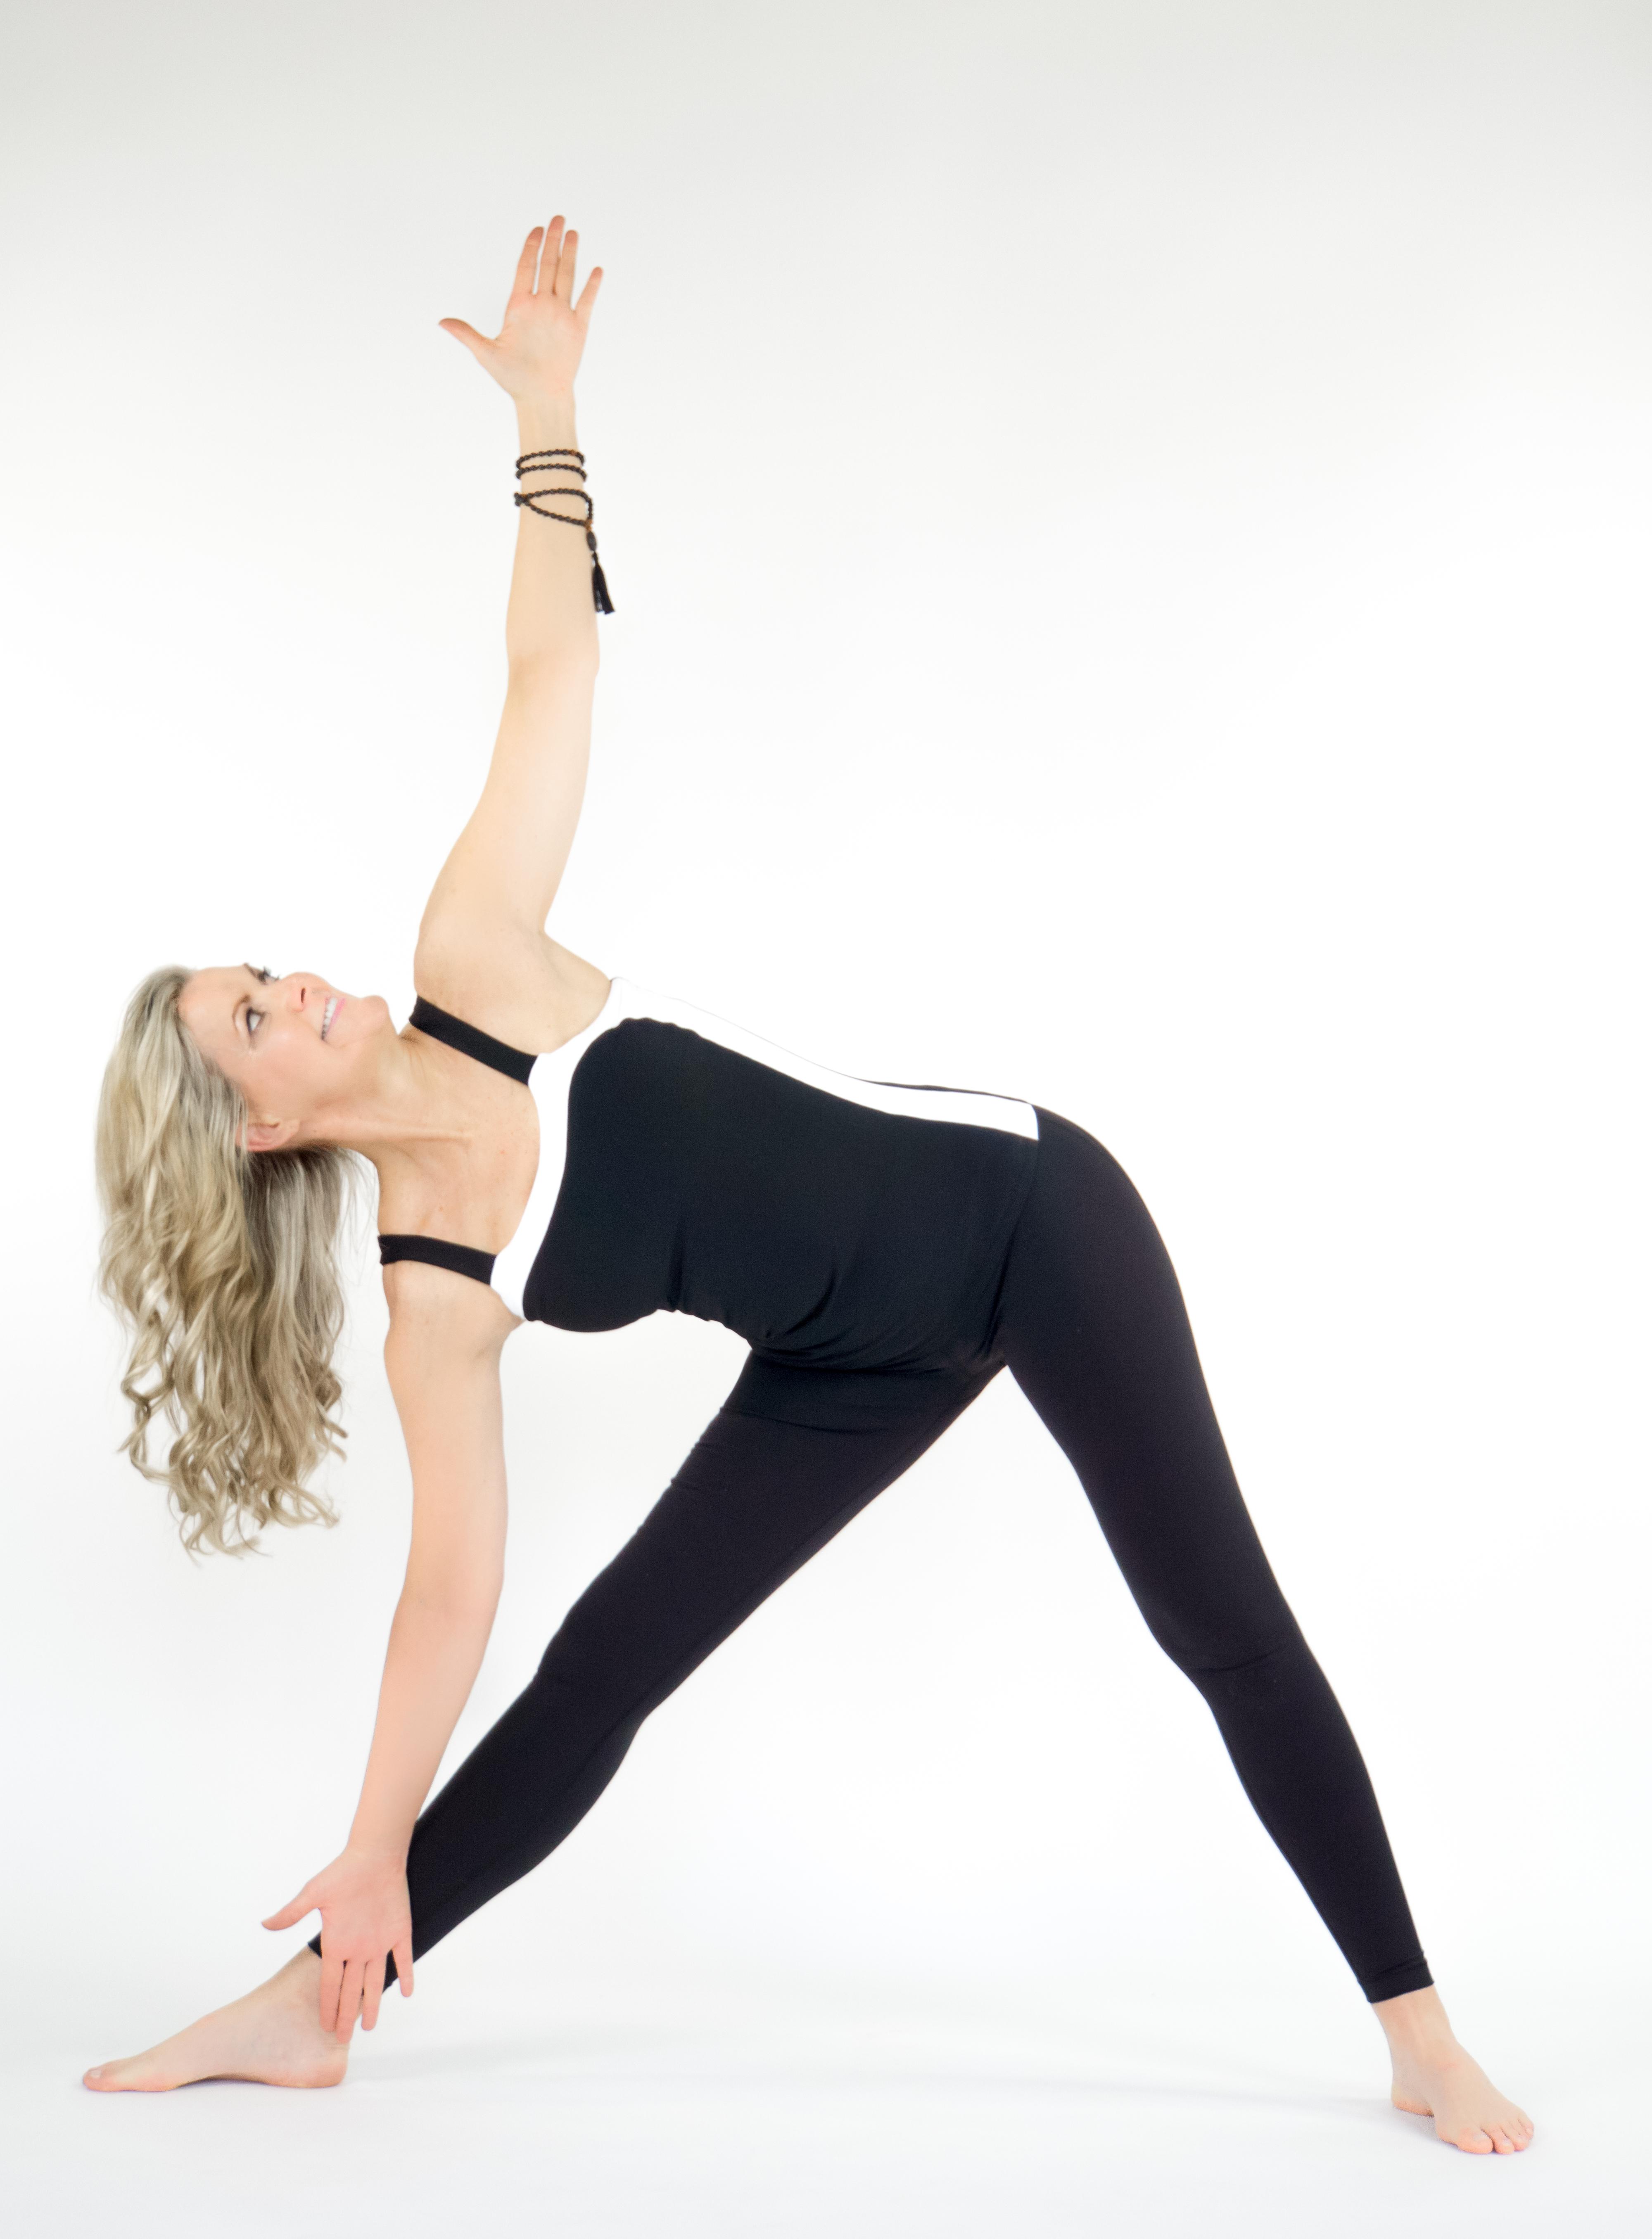 EXTENDED TRIANGLE POSE - Yoga Magazine